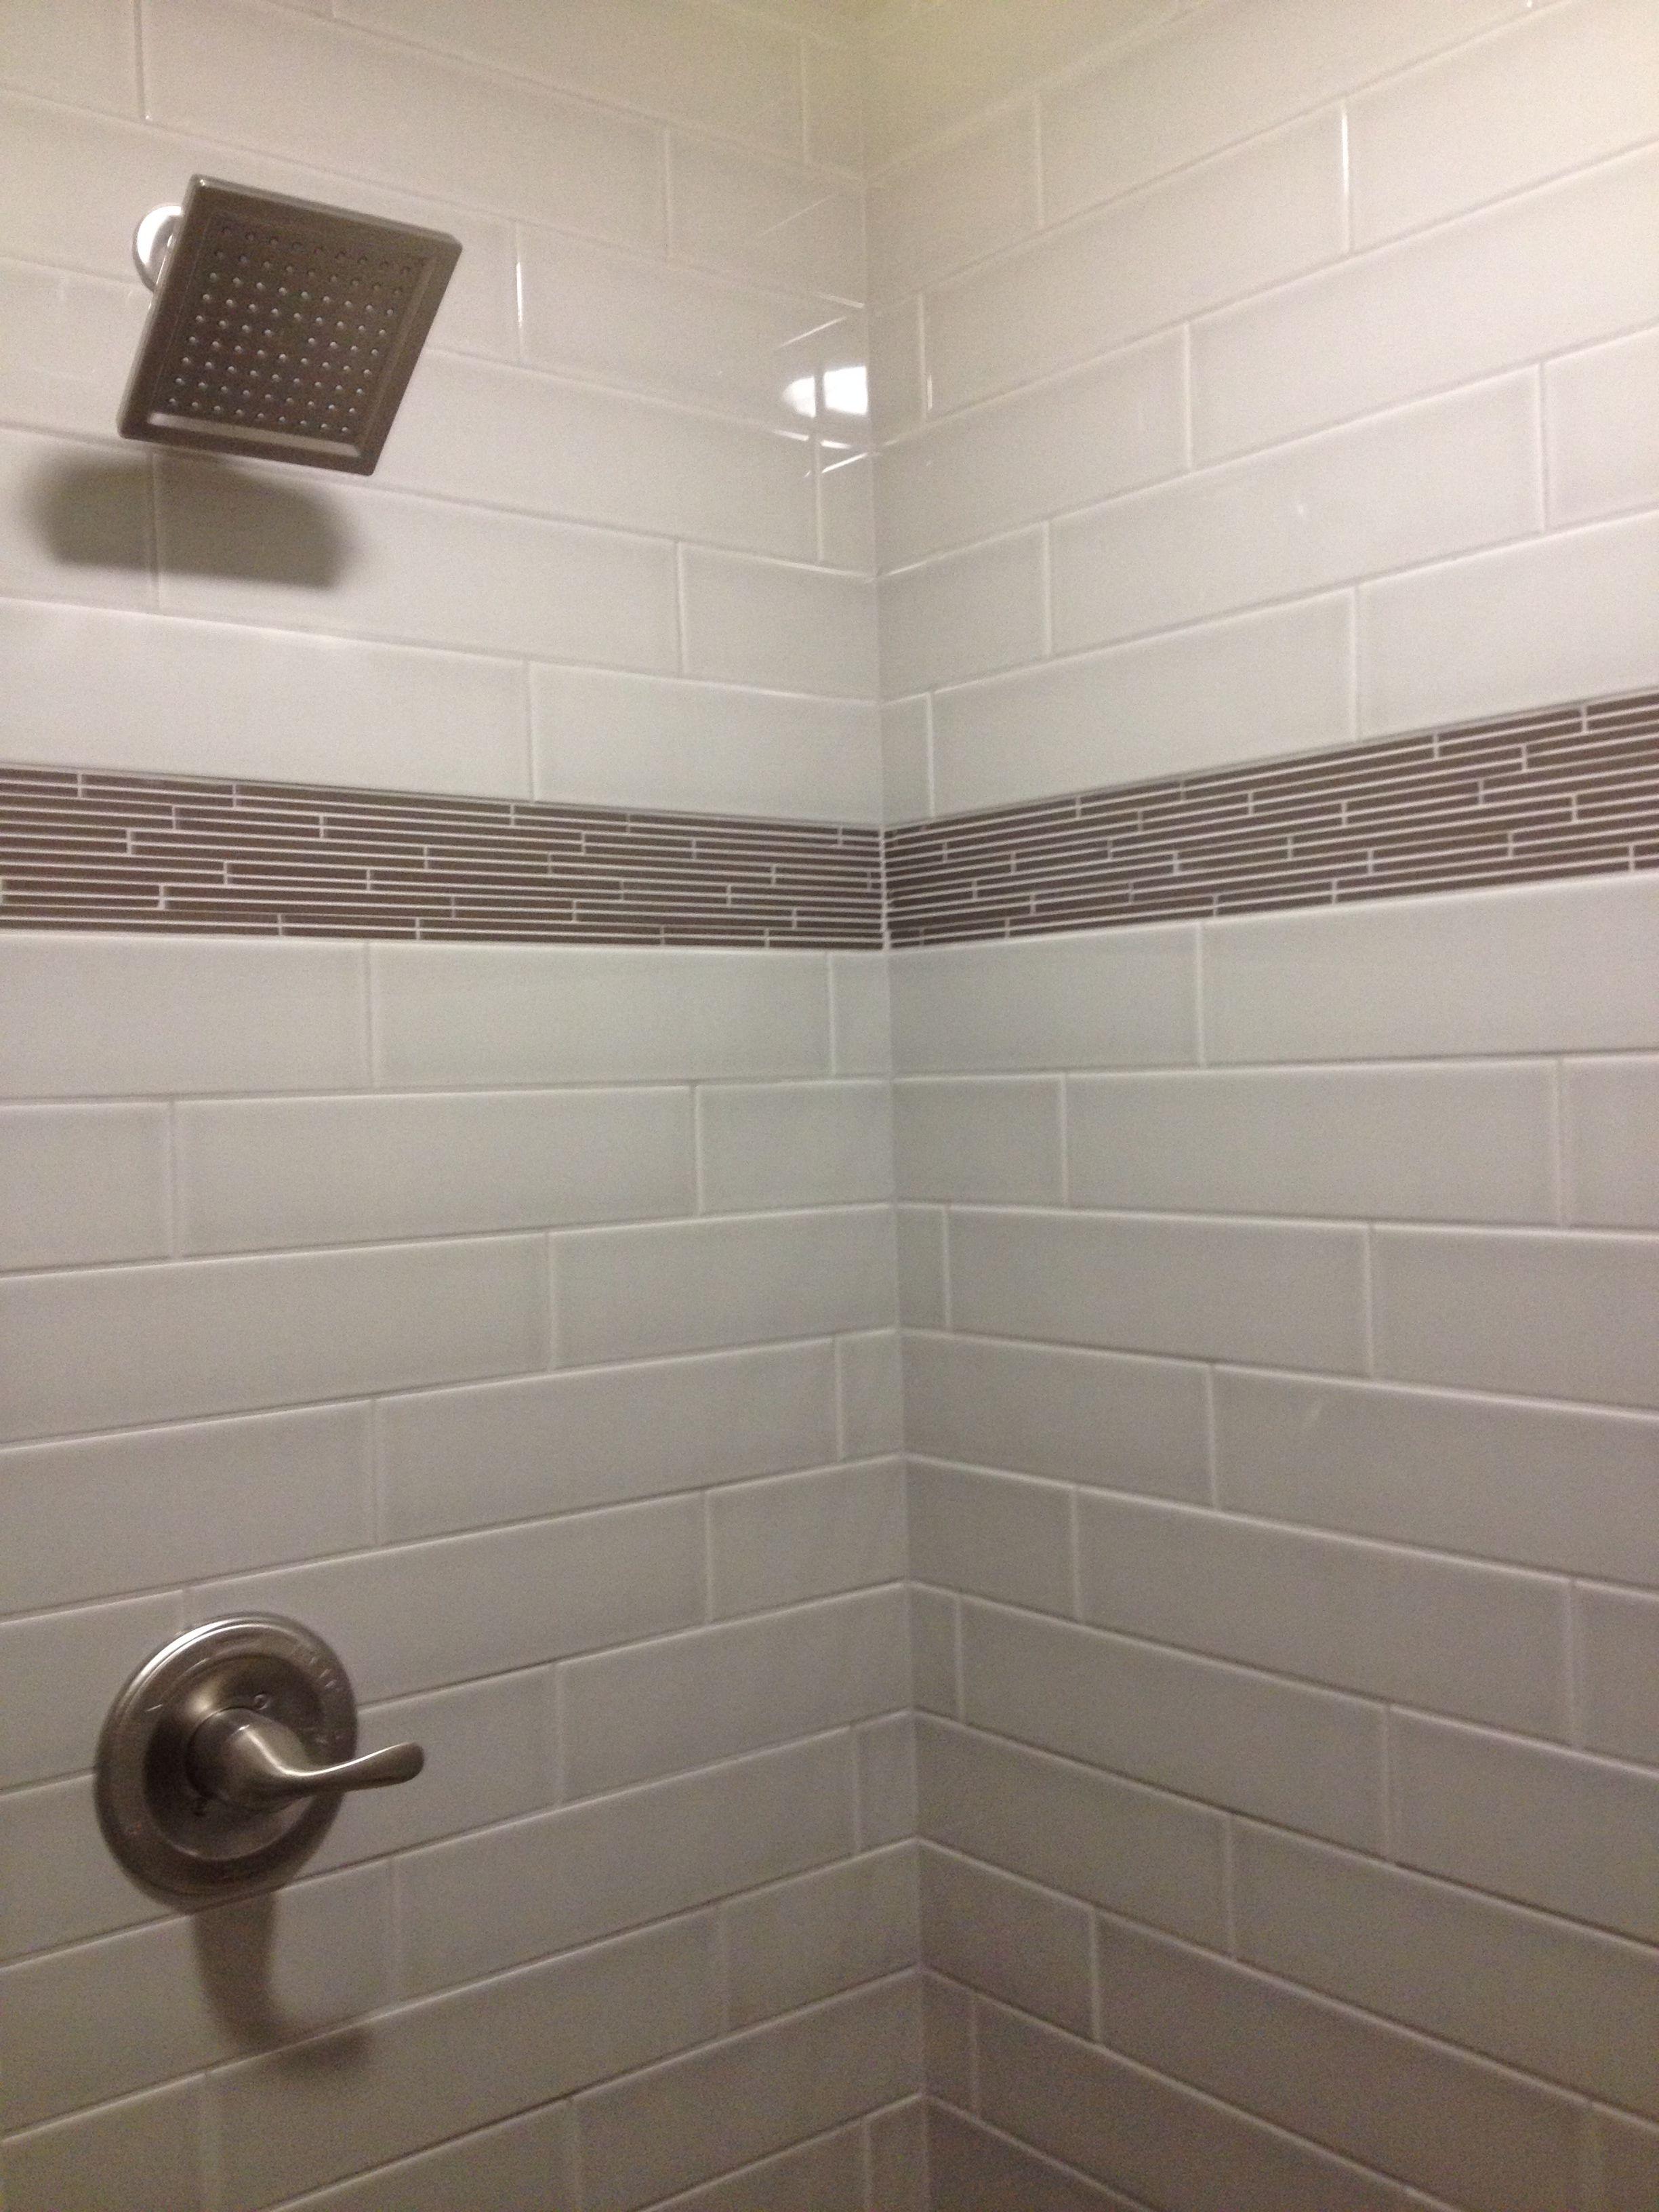 Creative Ways To Use Subway Tile Subway Tiles Subway Tile